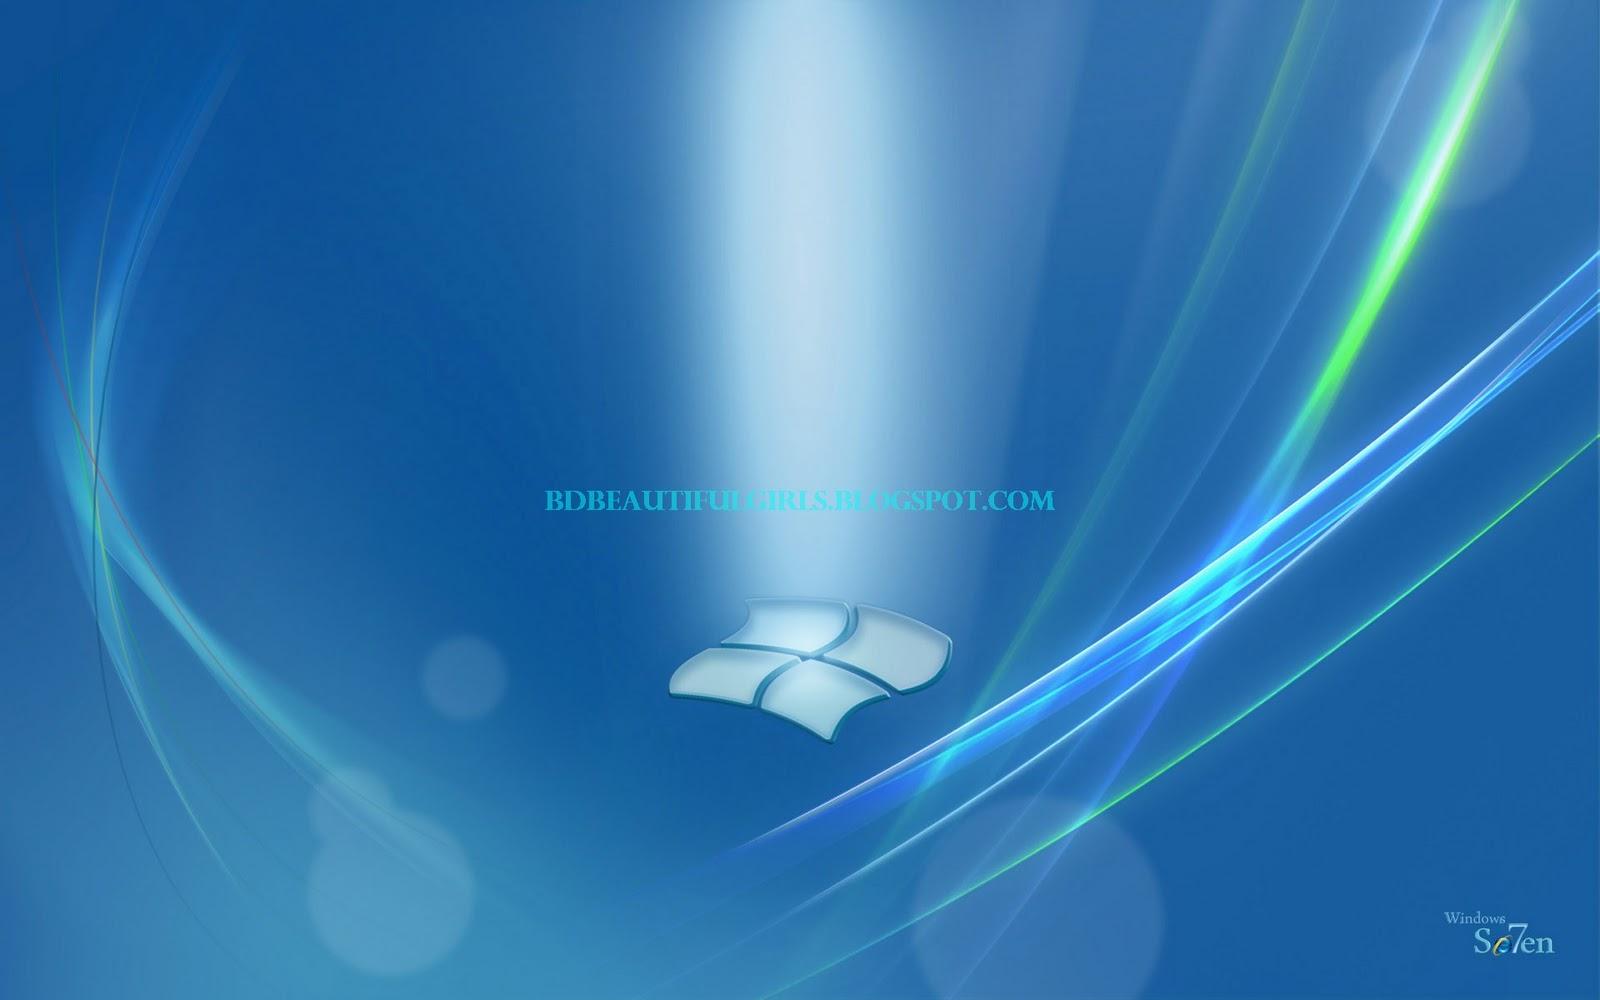 High Definition Windows 10 Wallpaper 1600x1000